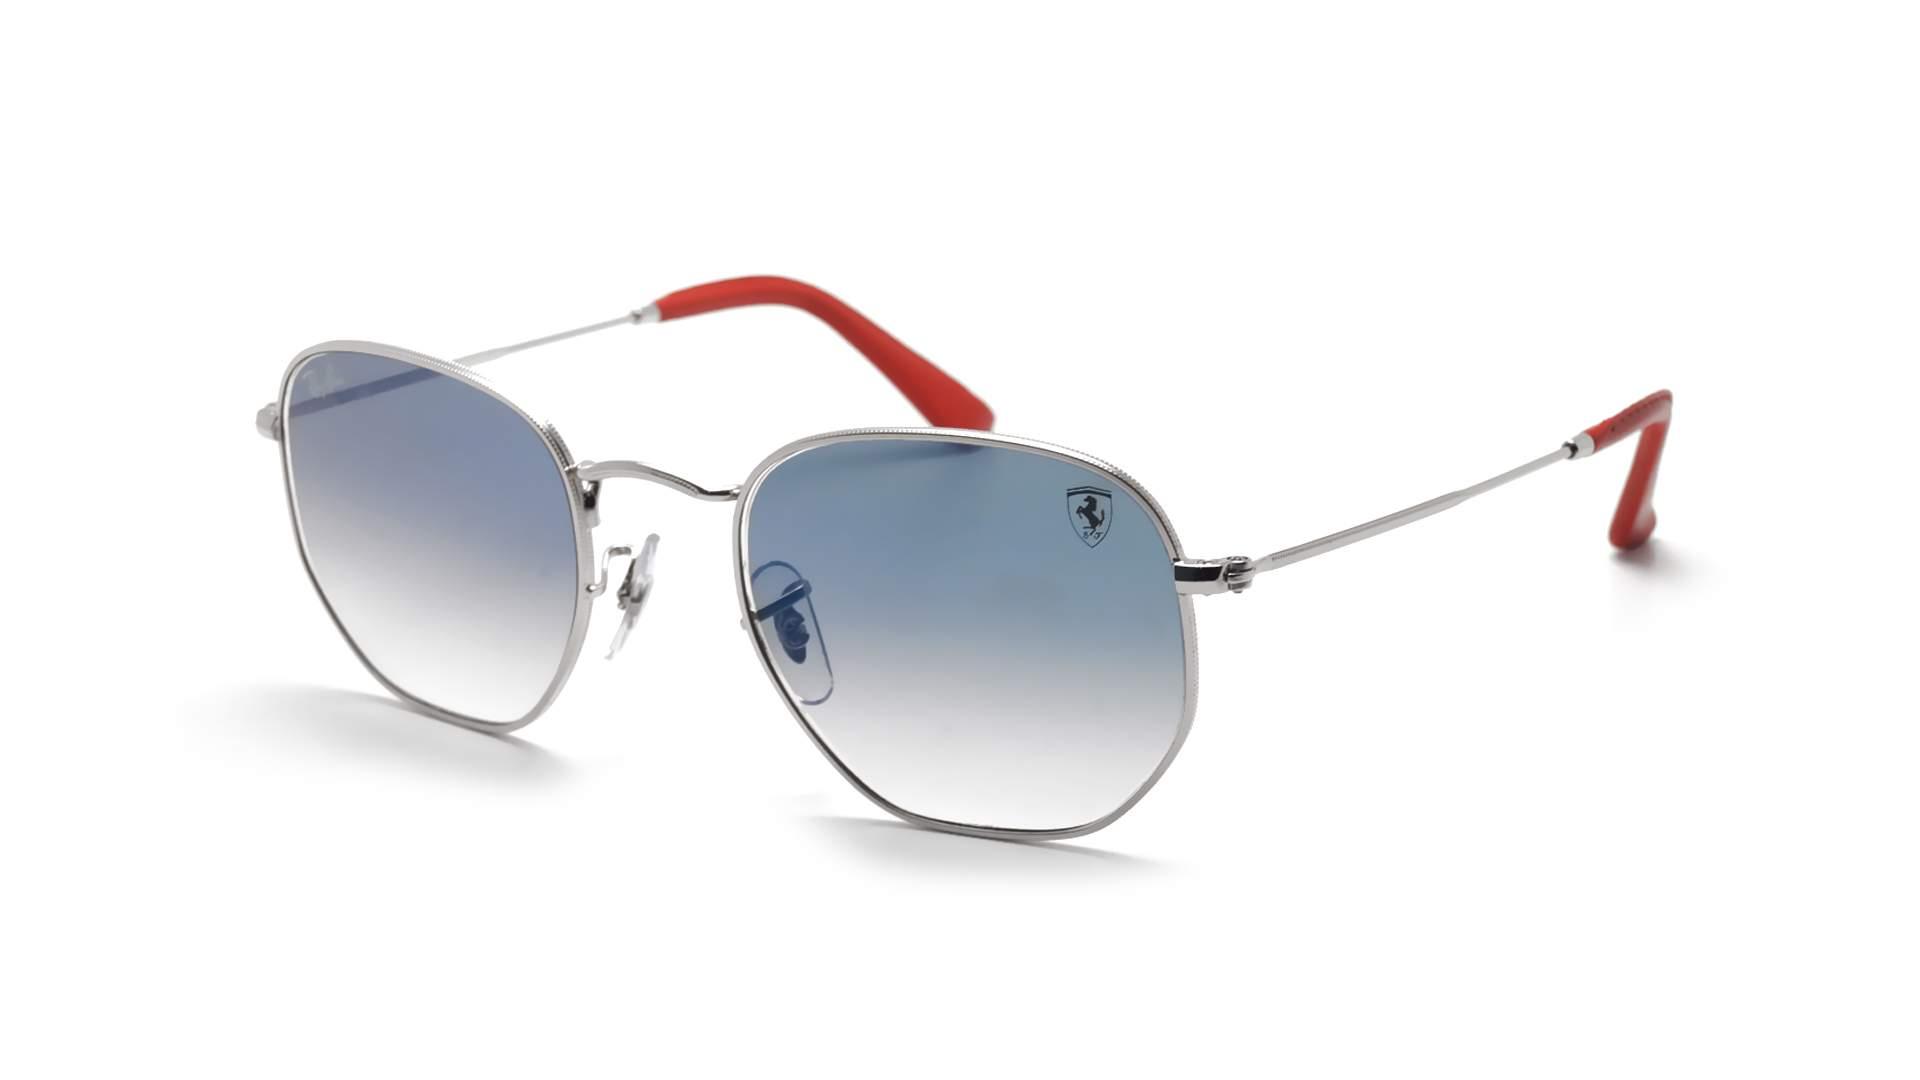 45c79a6096 Sunglasses Ray-Ban Hexagonal Scuderia Ferrari Silver RB3548NM F007 3F 51-21  Medium Gradient